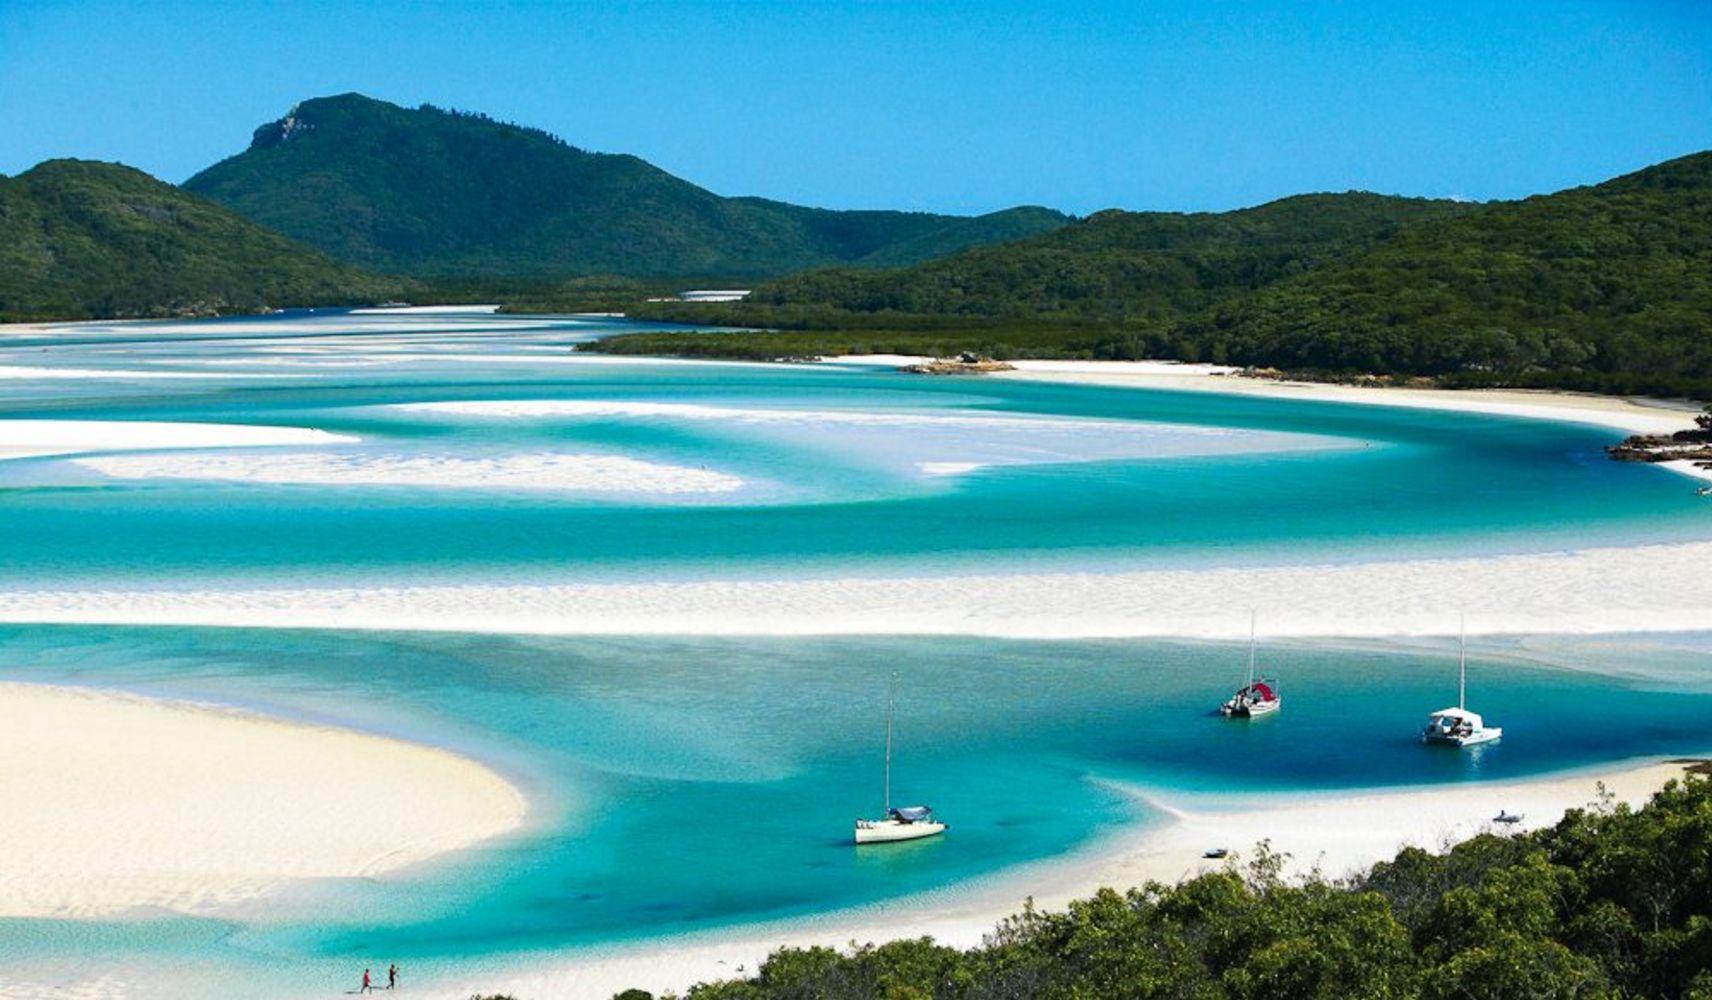 Whitehaven Beach, Whitsunday Islands, Australia - 2023 solar eclipse tour